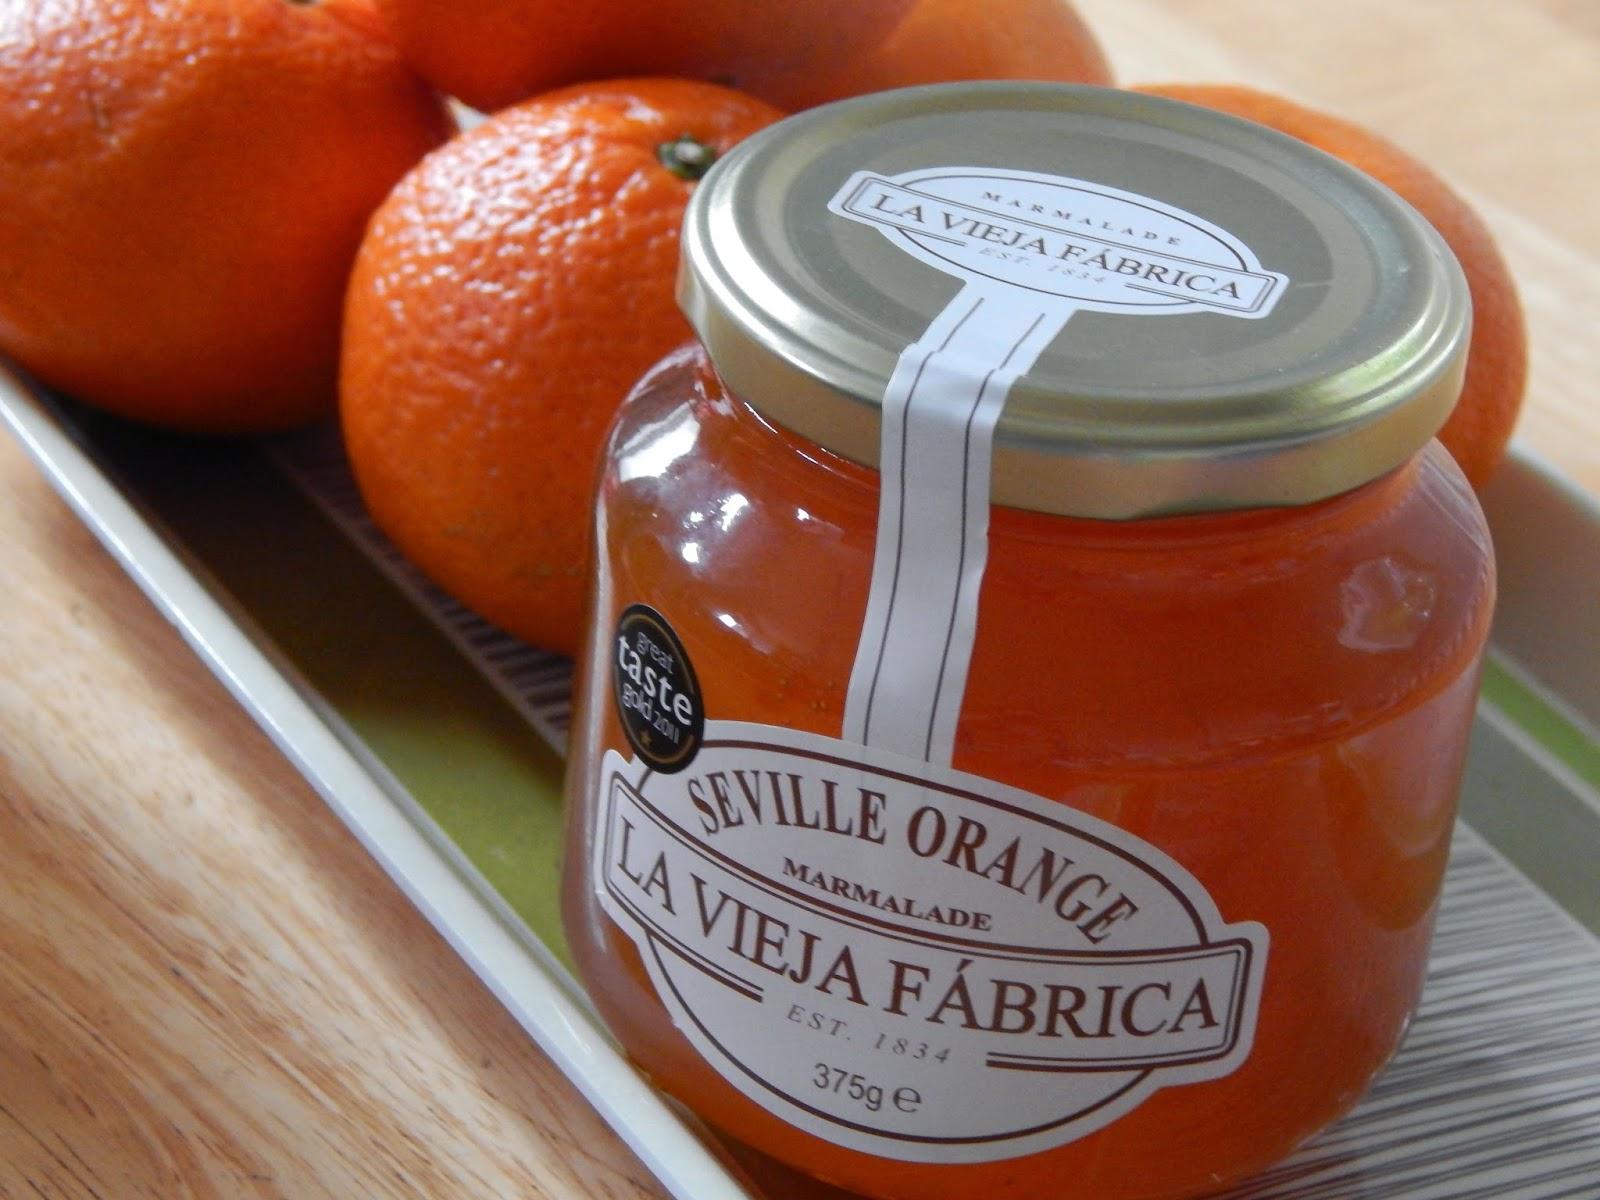 La Vieja Fabrica Marmalade